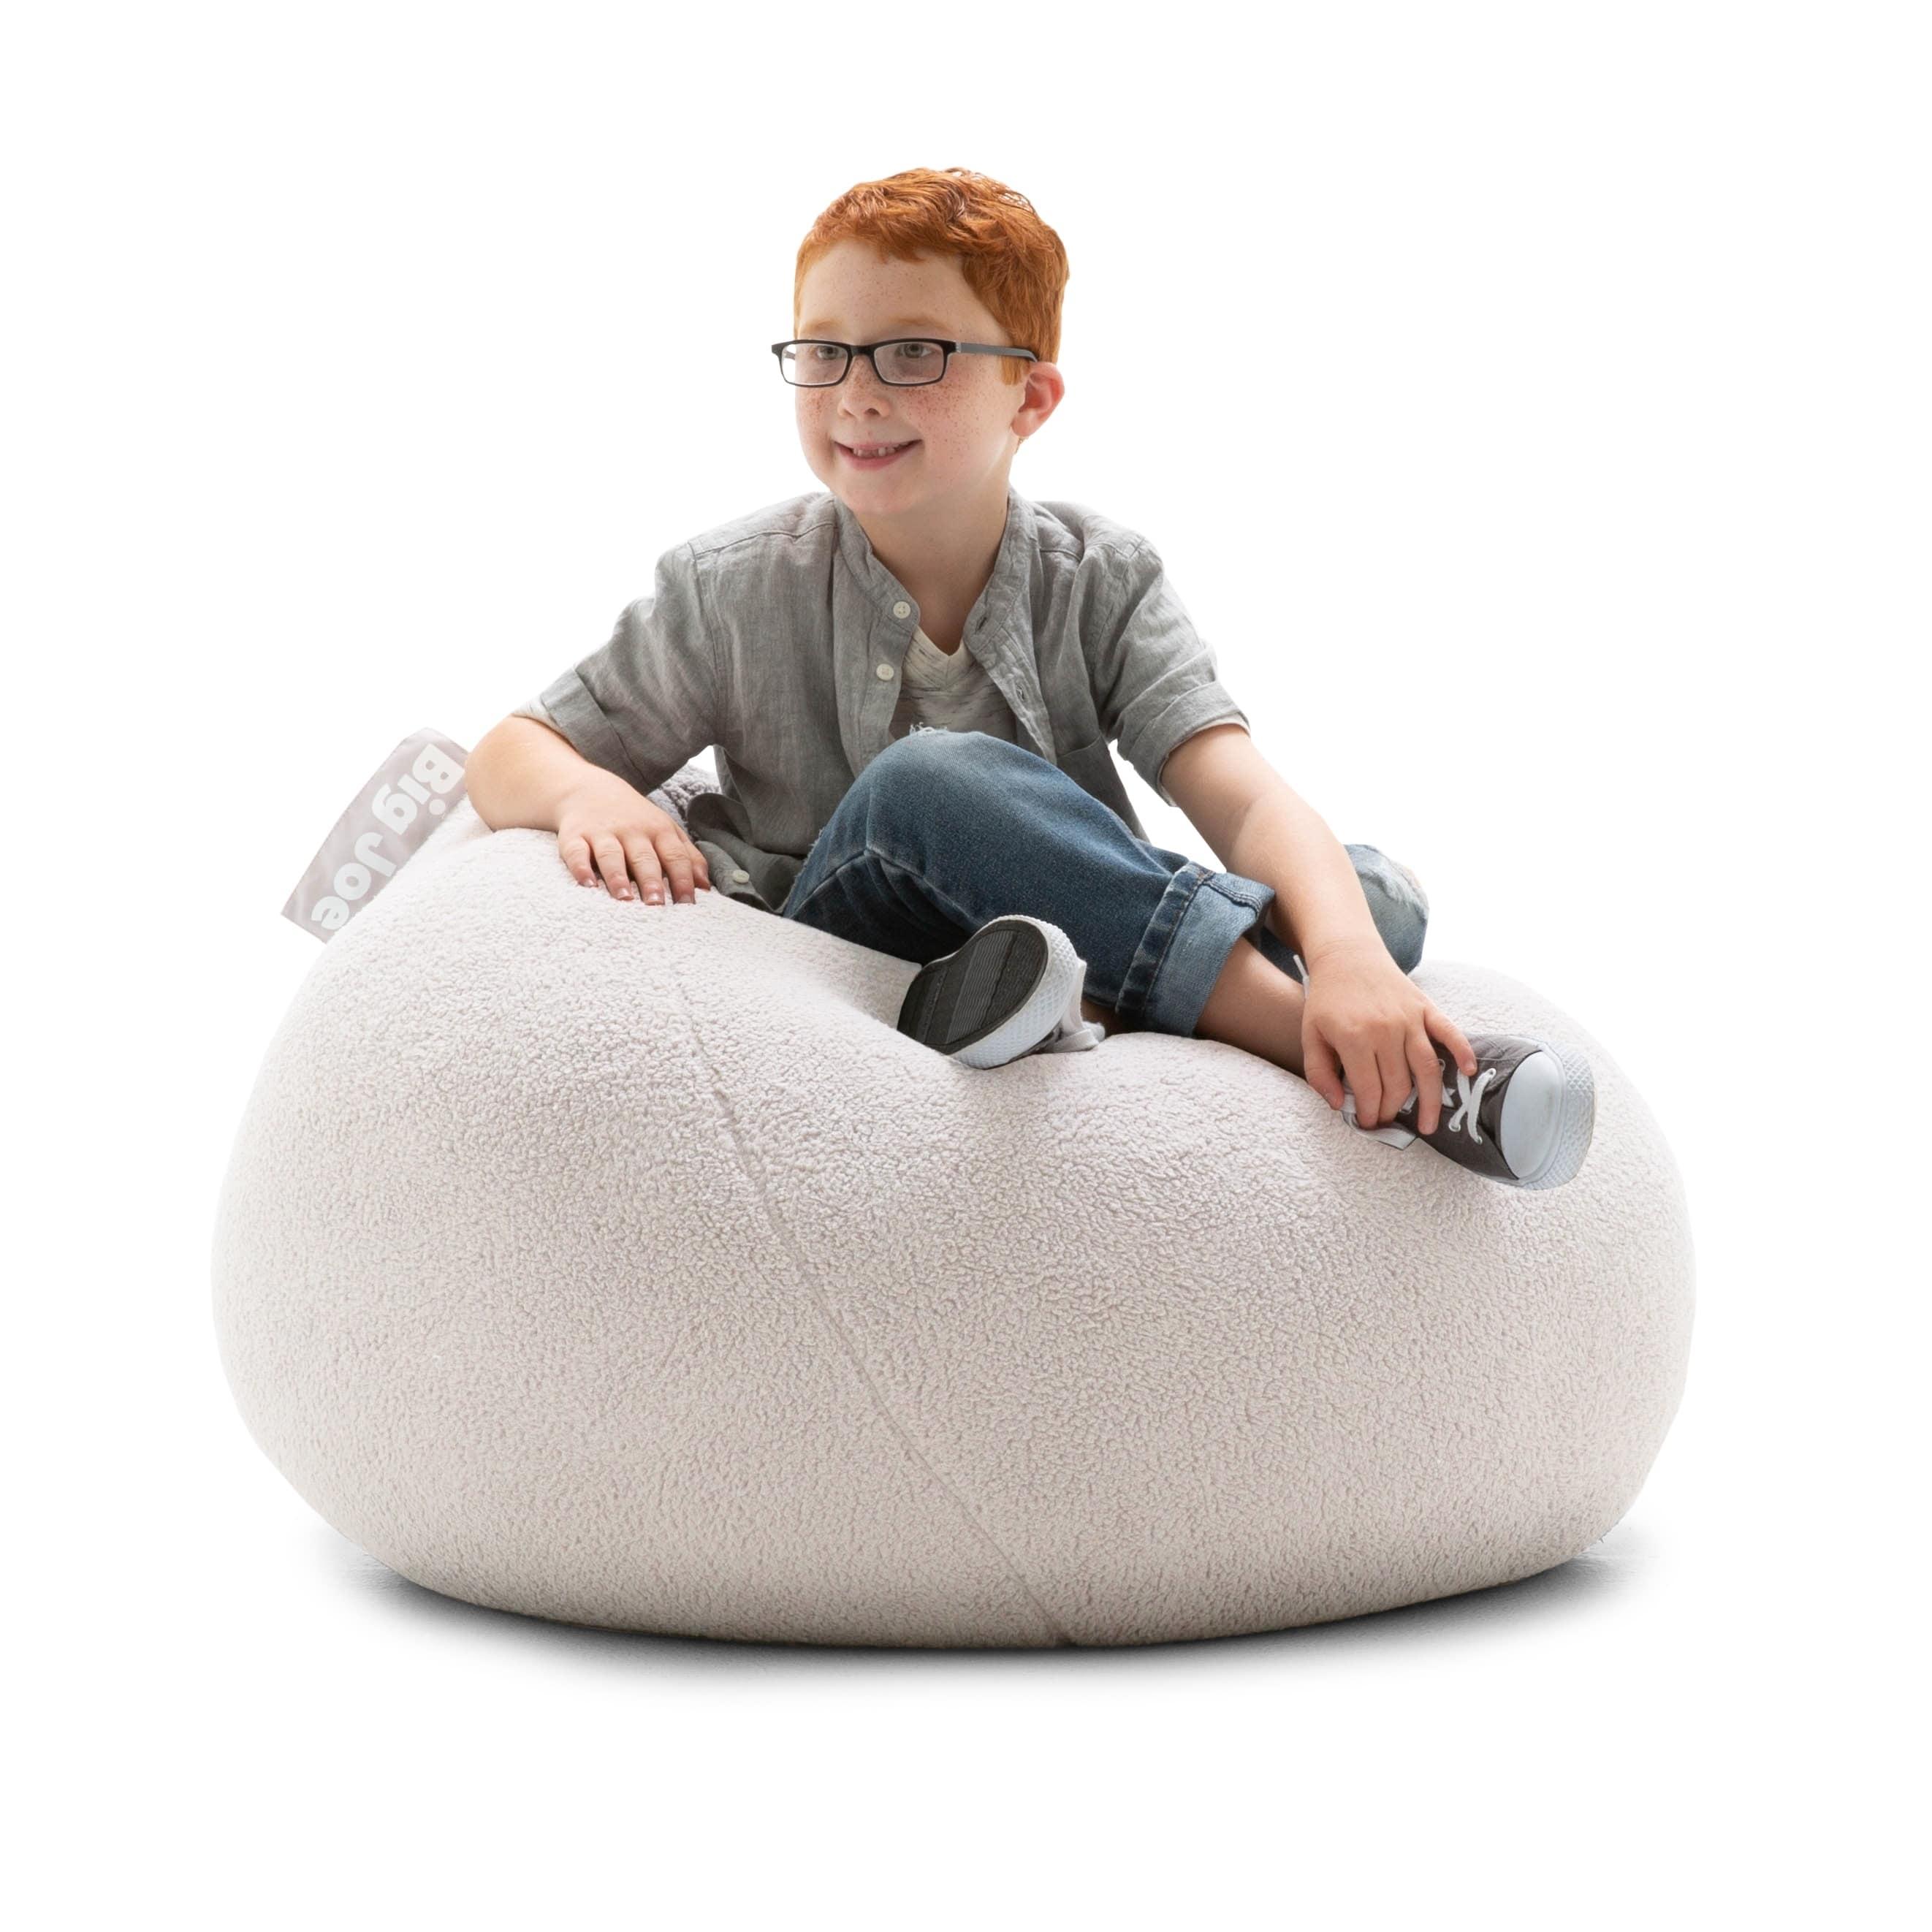 Tremendous Big Joe Ultra Lounge Bean Bag Chair Ivory Sherpa Cjindustries Chair Design For Home Cjindustriesco